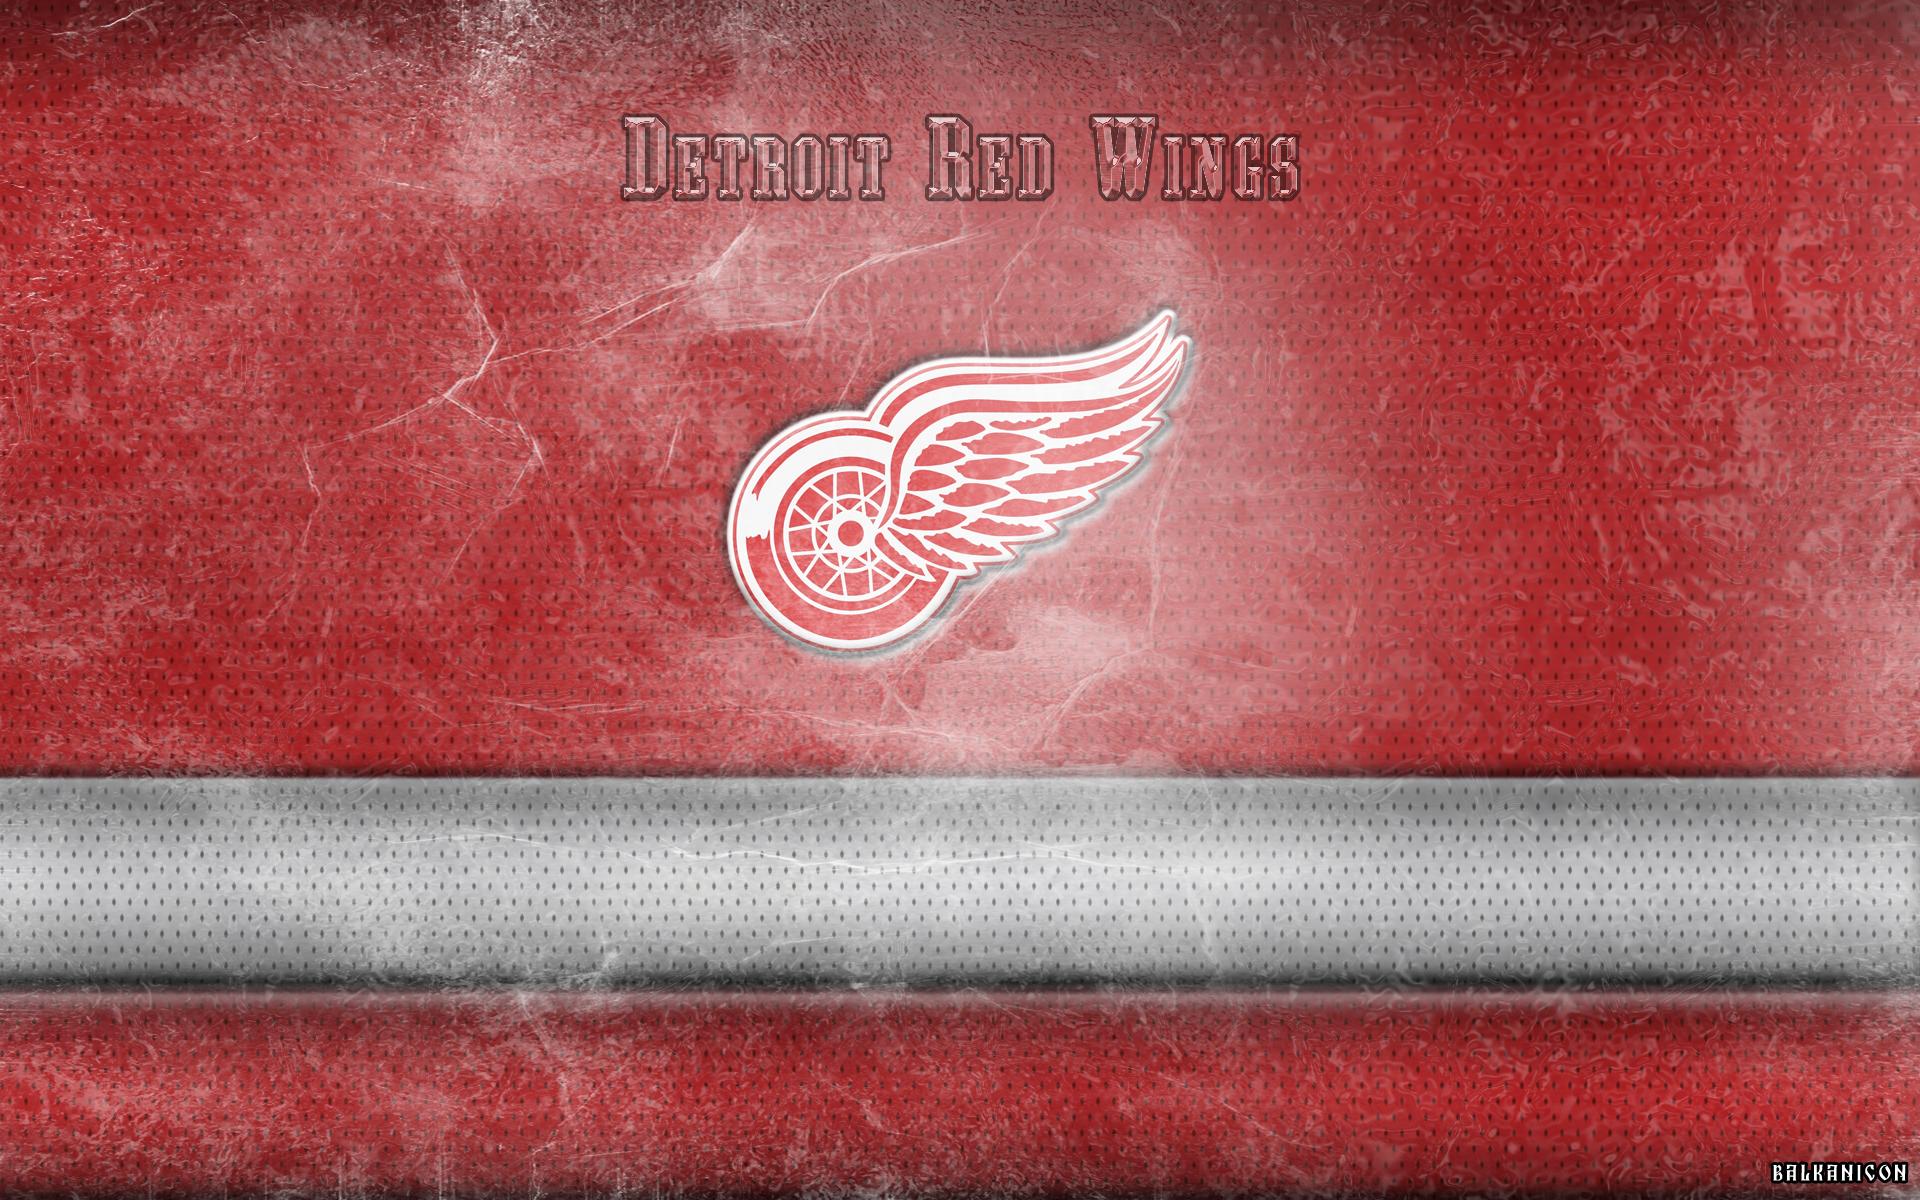 Detroit Red Wings Wallpaper By Balkanicon On Deviantart